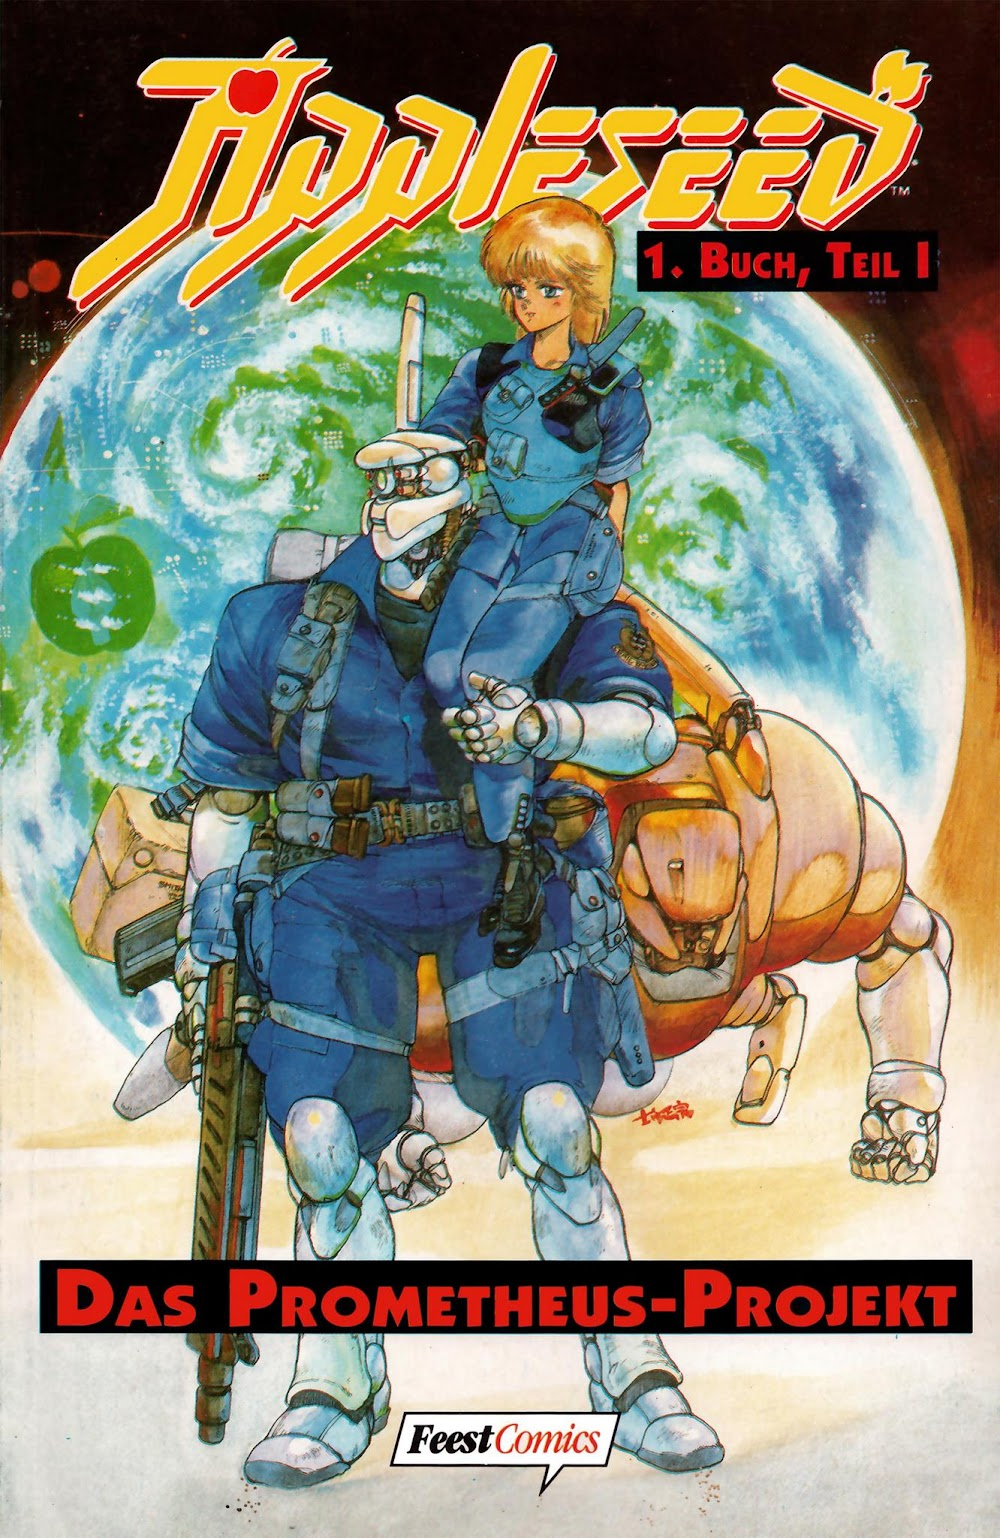 Appleseed (1994) - komplett